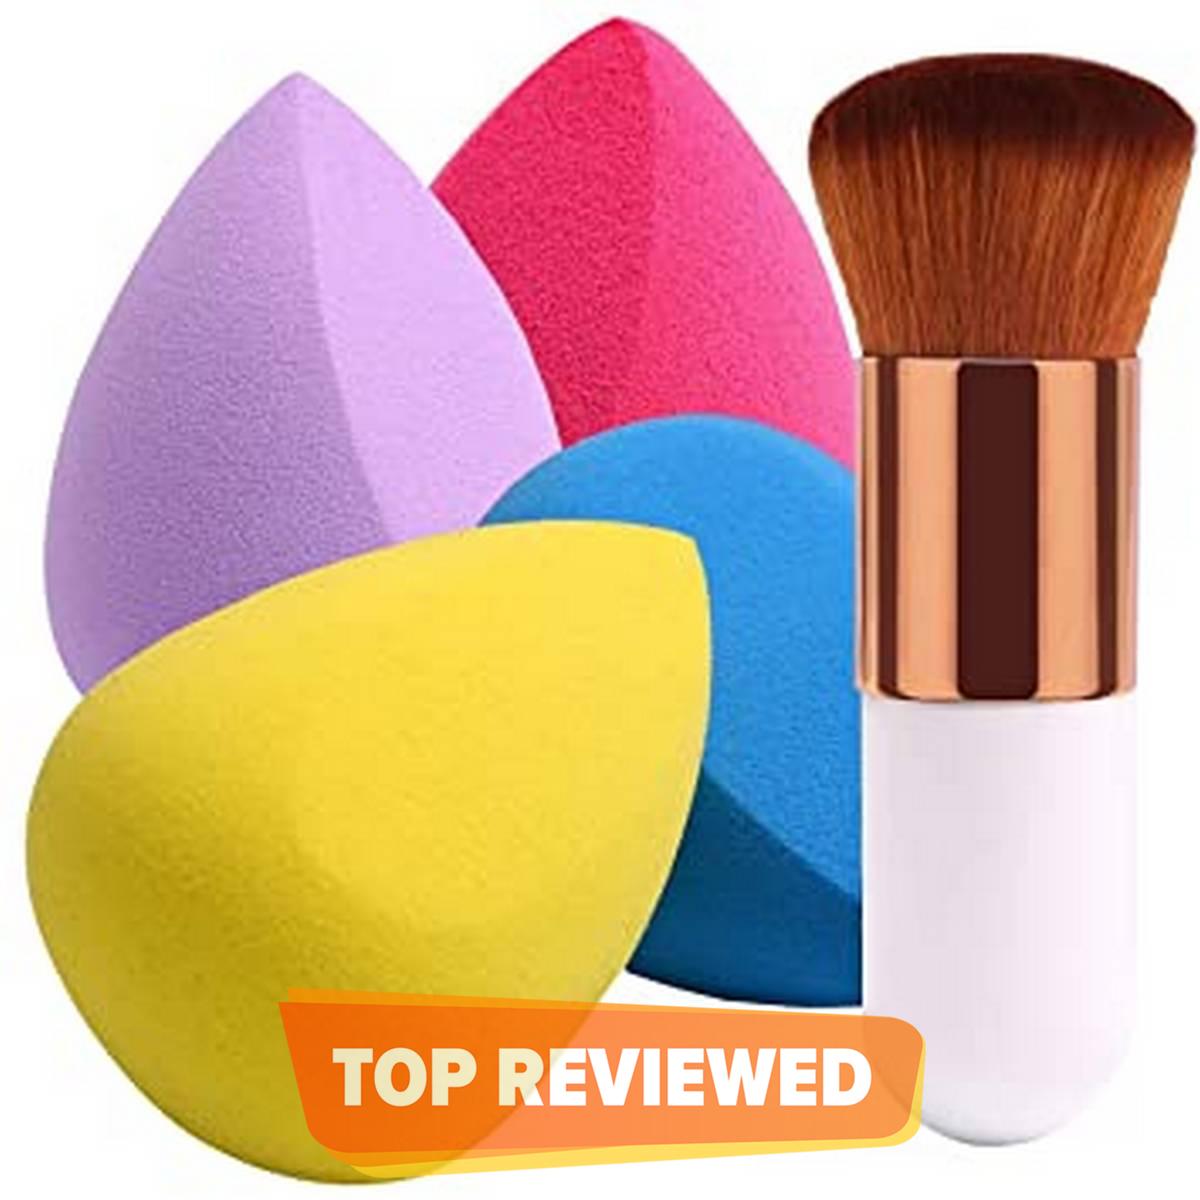 Deals of 2 Makeup Foundation Brush Kabuki With Beauty Blender Makeup Sponge Puff